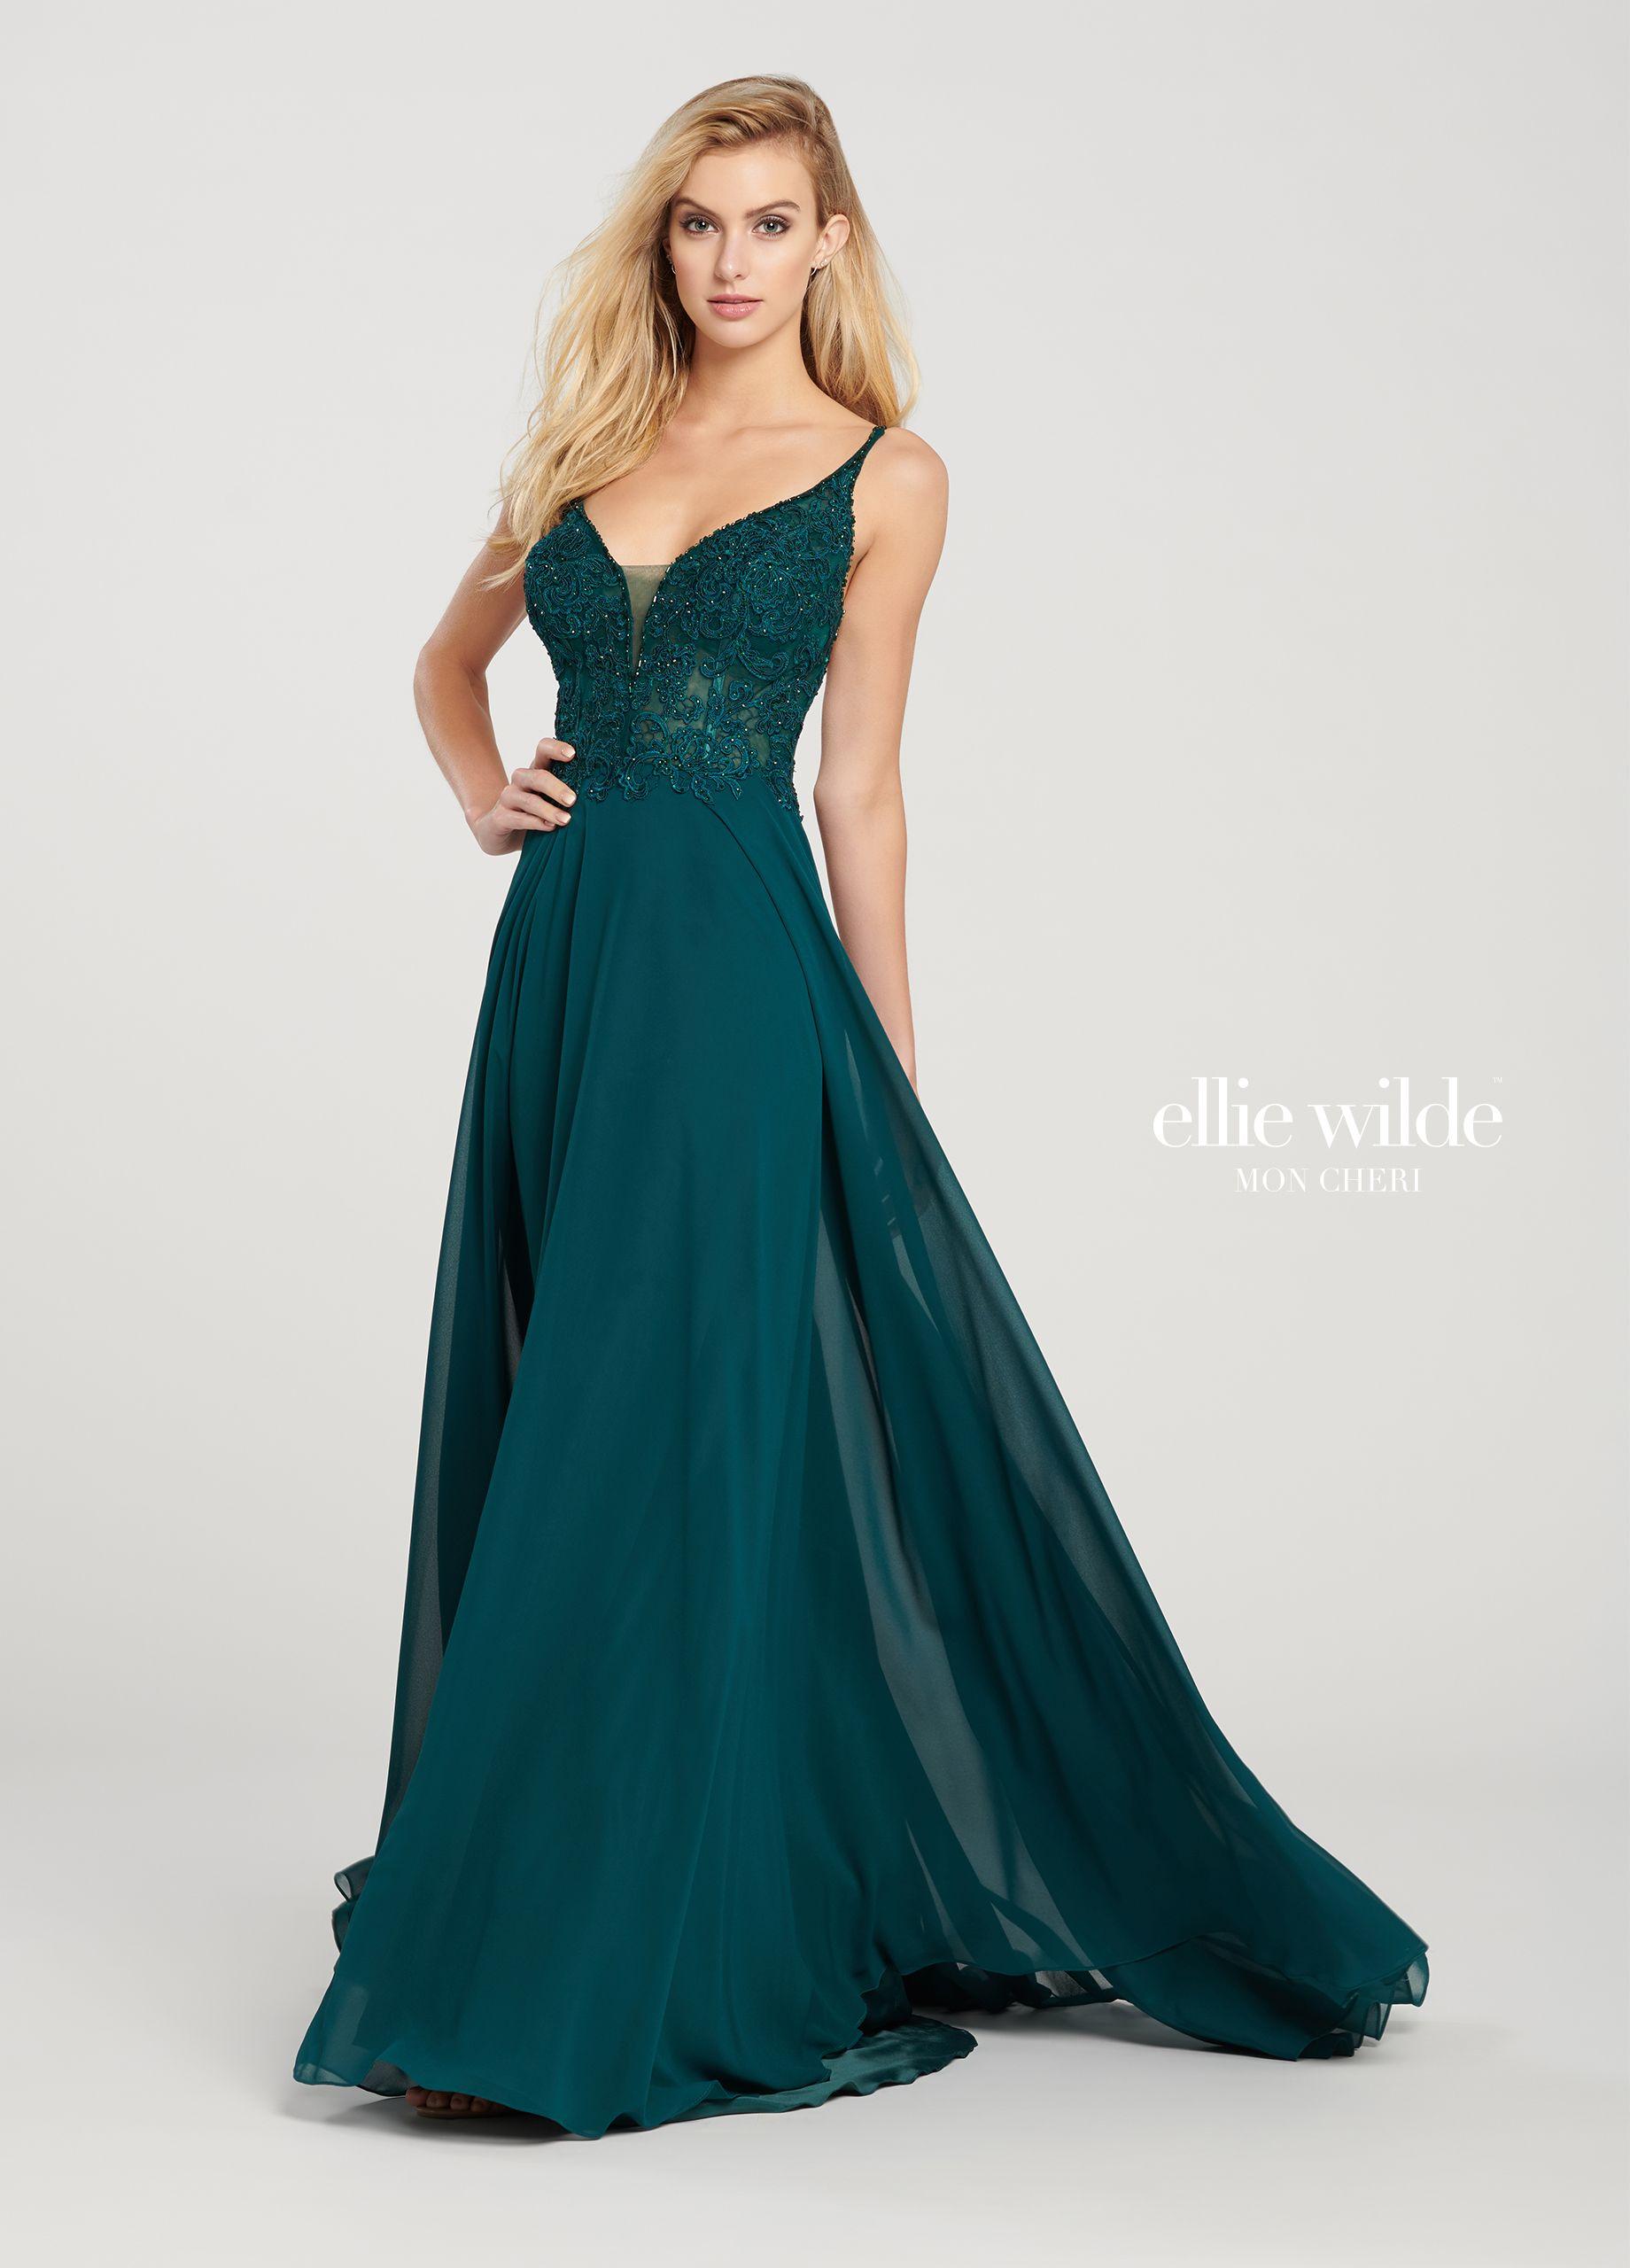 d4e50defad A-Line Prom Dress with a Beaded Bodice   Chiffon Skirt- EW119155 ...